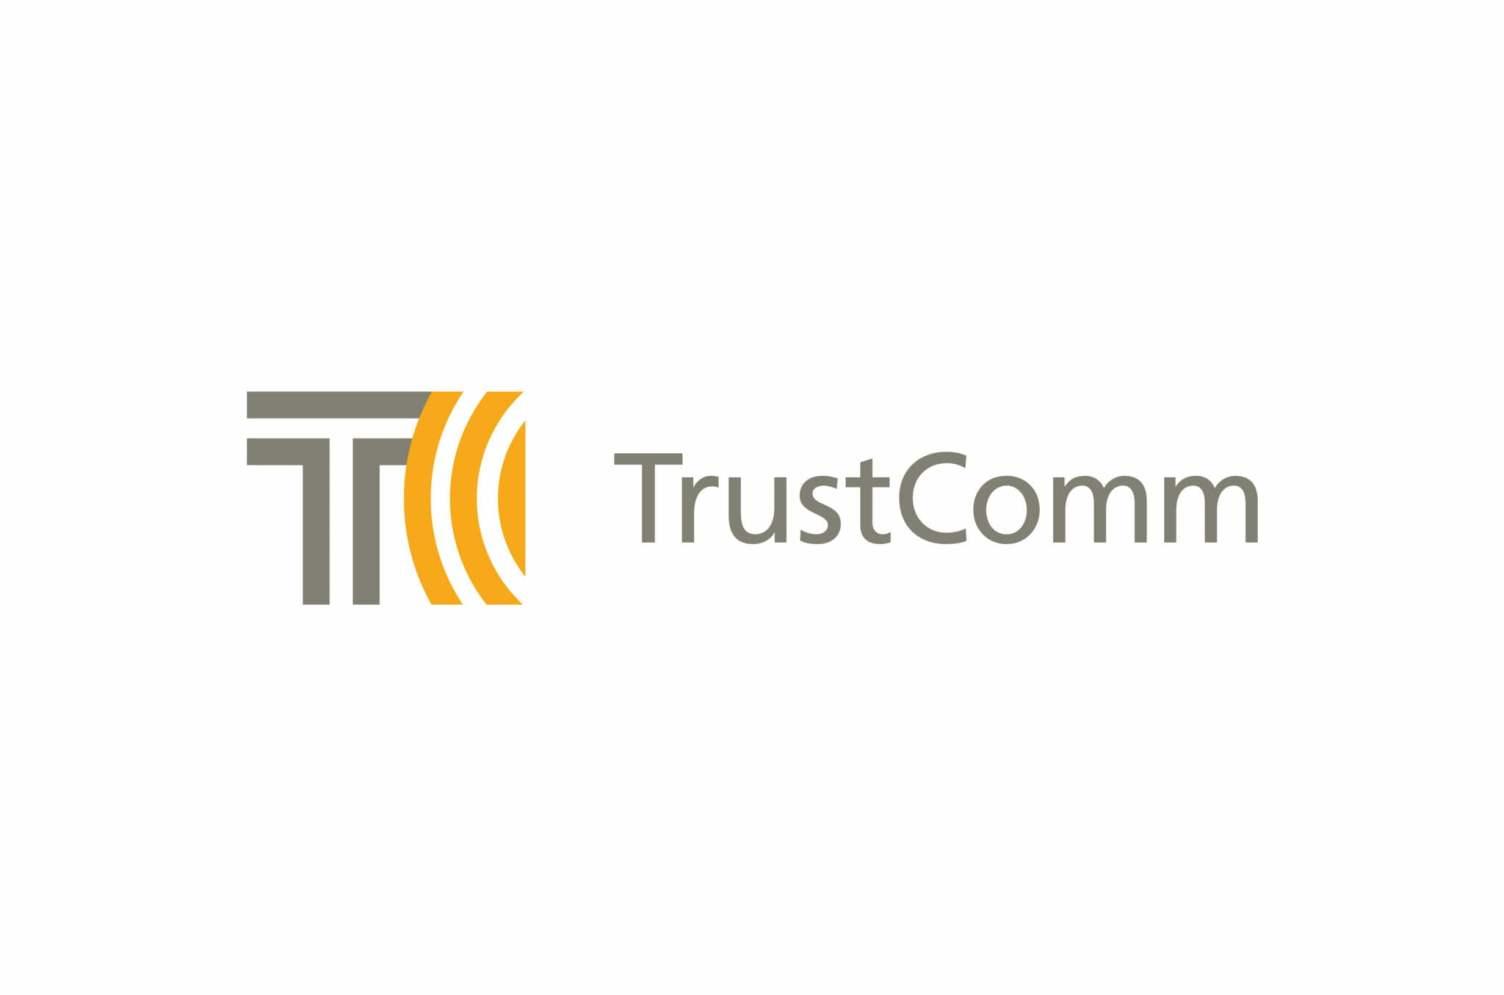 TrustComm Logo